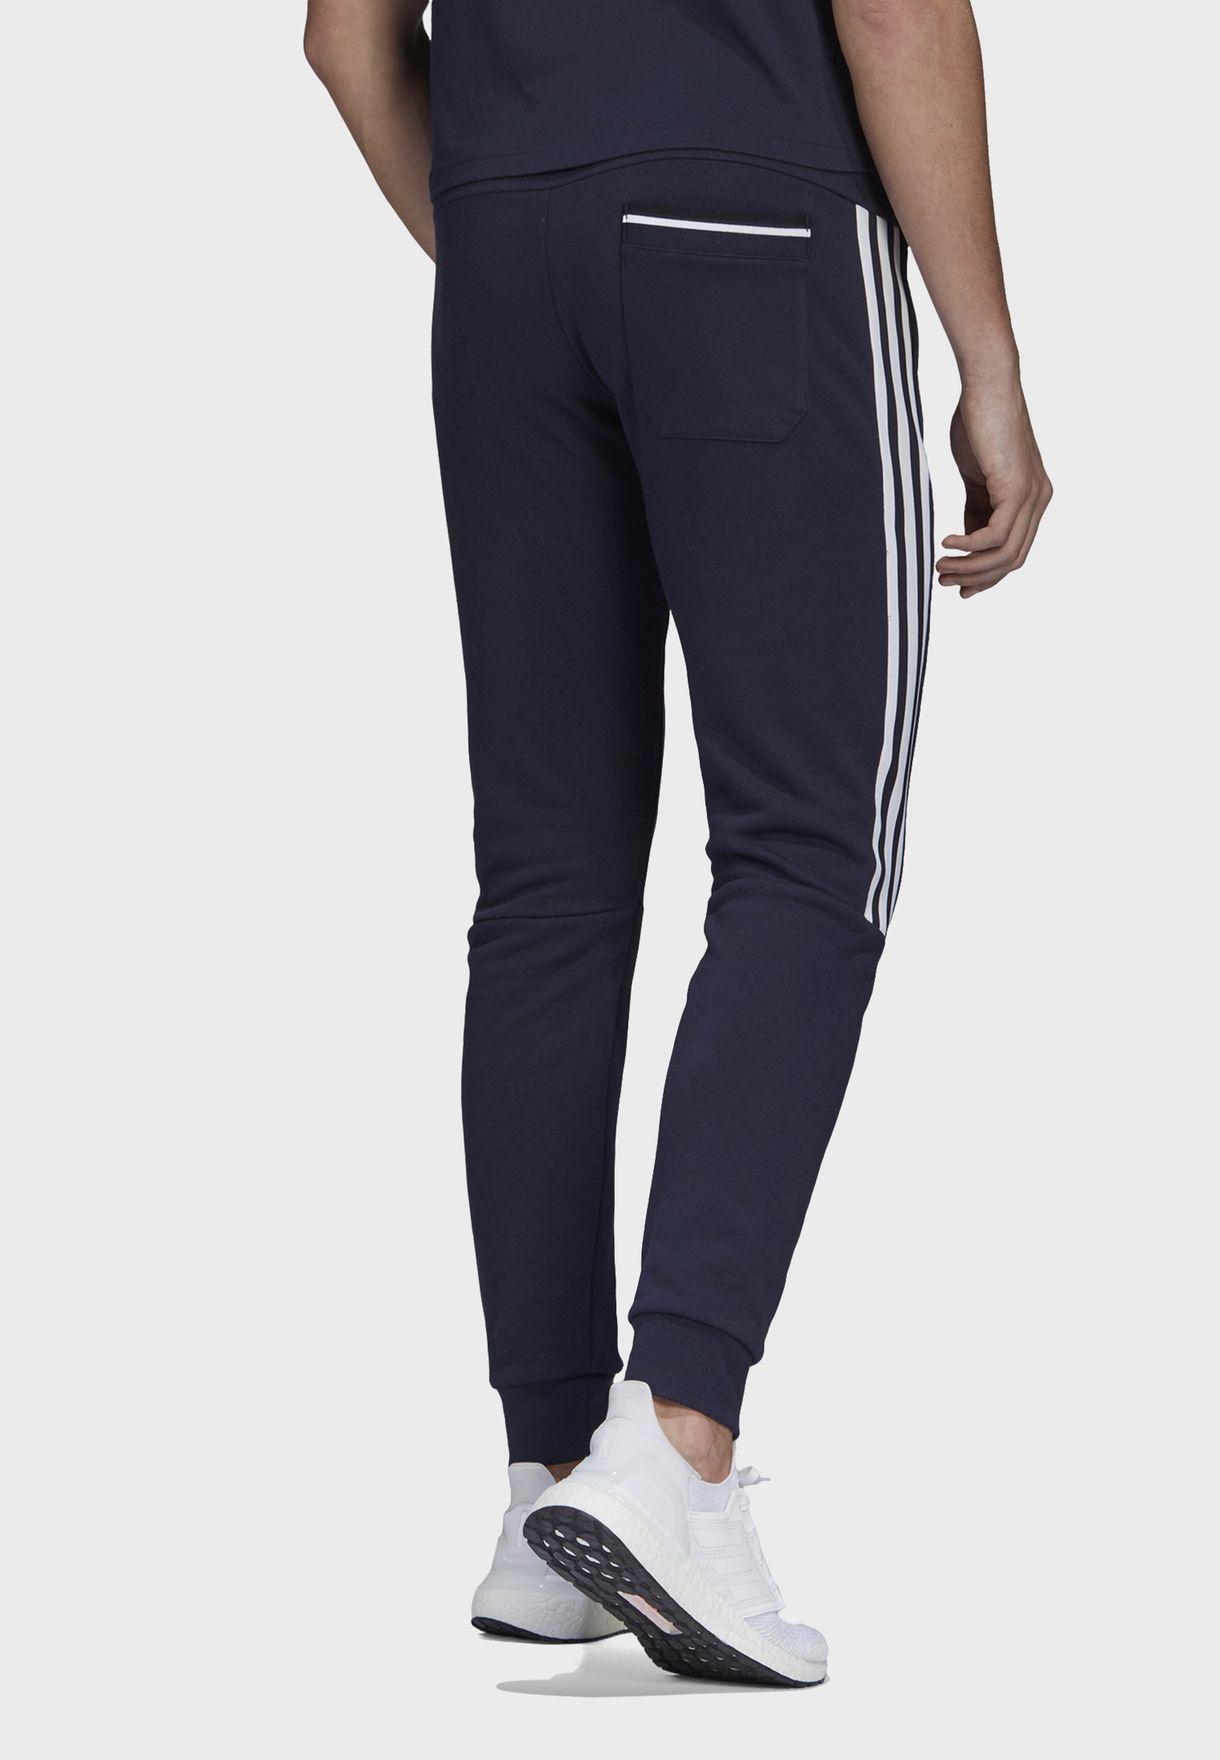 3 Stripes Sportswear Sports Men's Jogger Pants